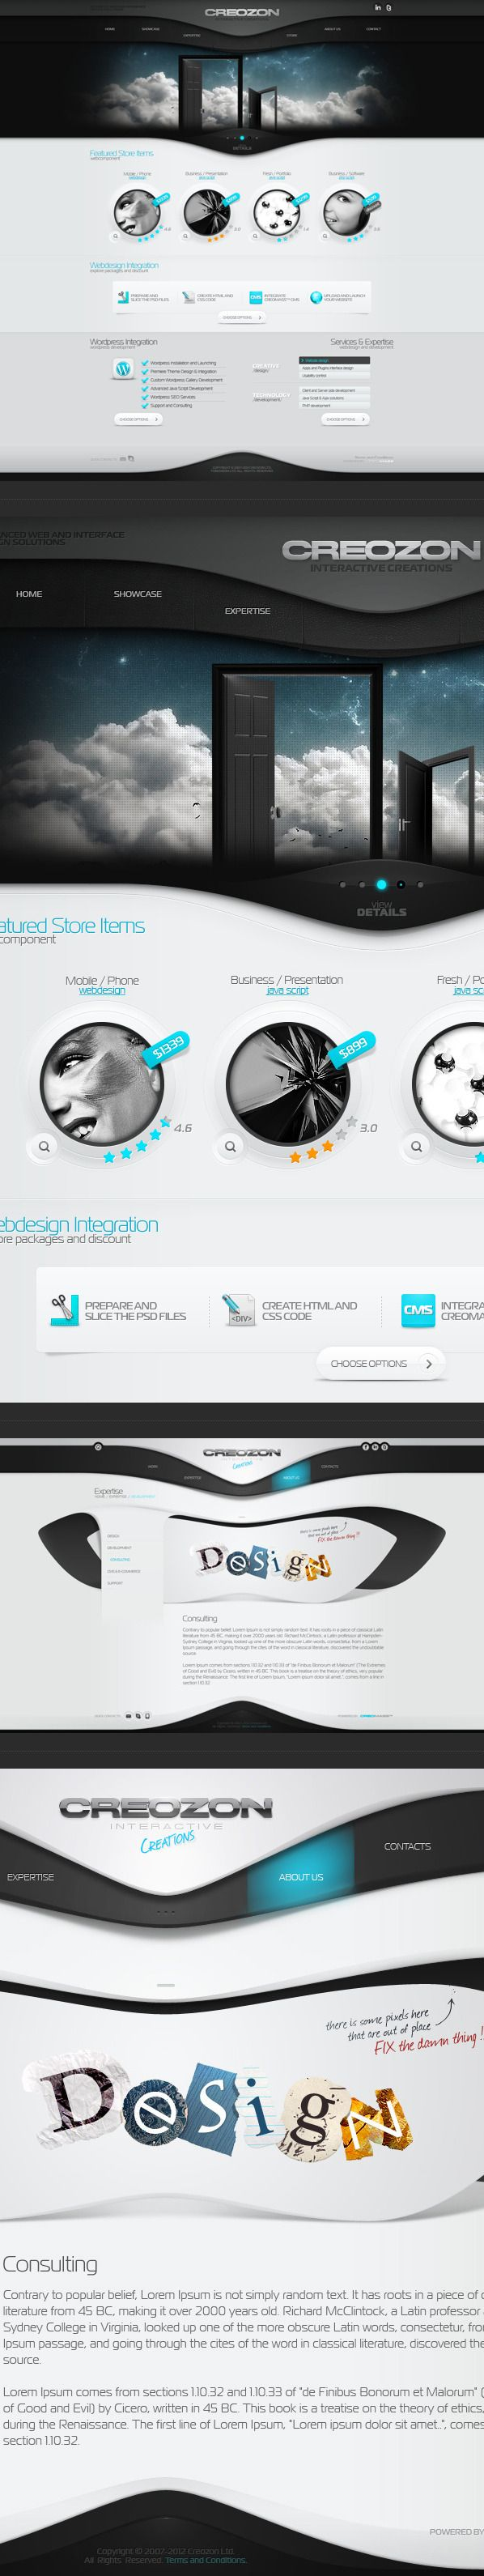 Creozon website by Tsvetelin Nikolov, via Behance